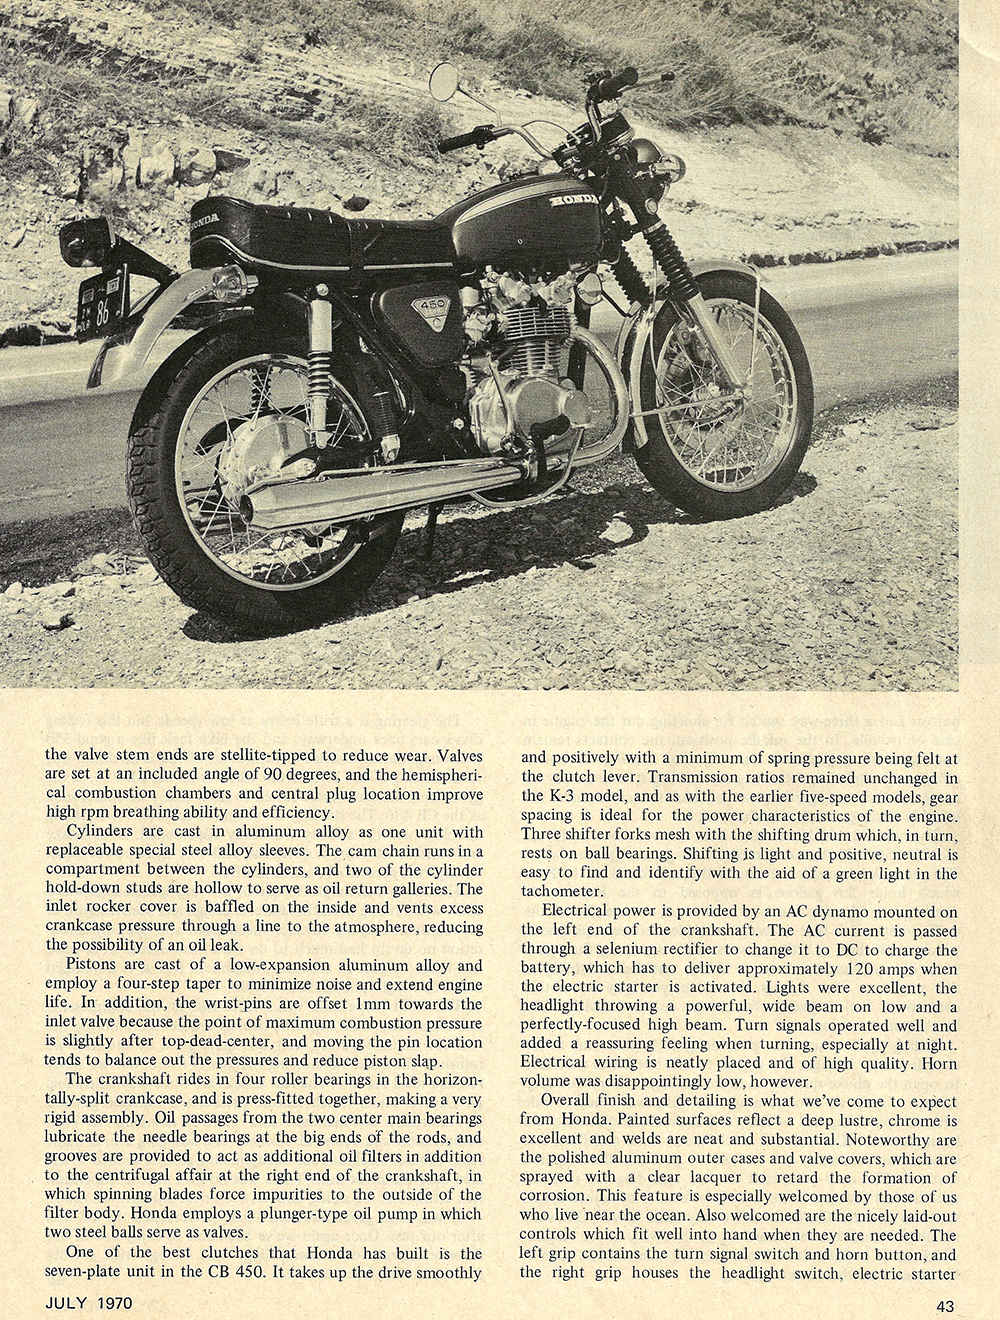 1970 Honda CB450 road test 03.jpg